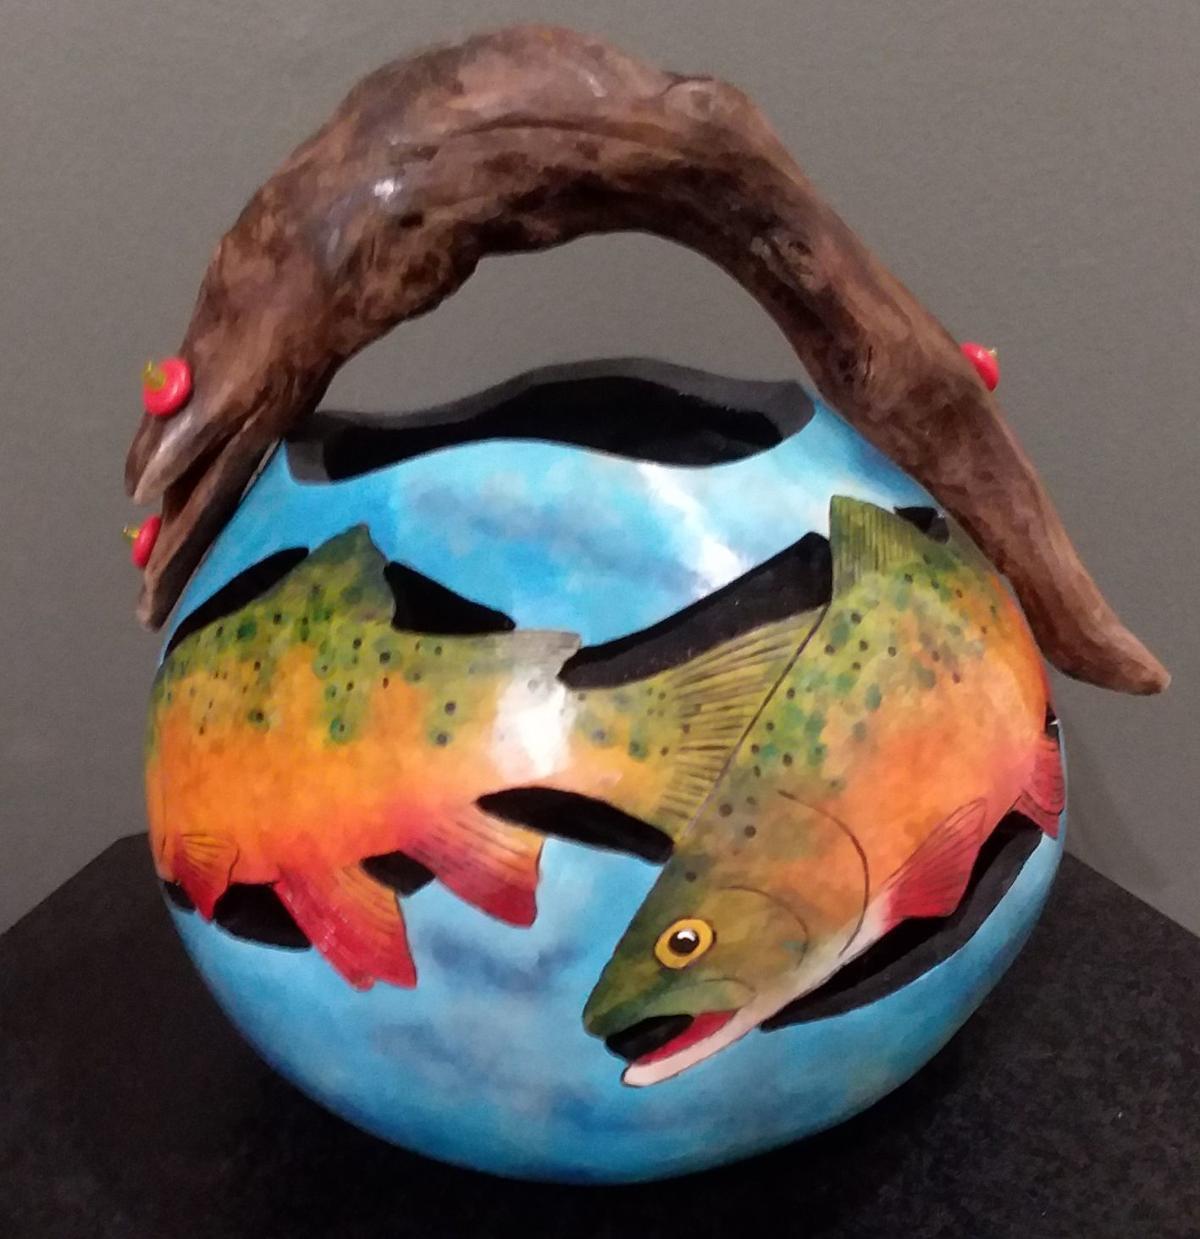 Gourd by Sunny Kudo